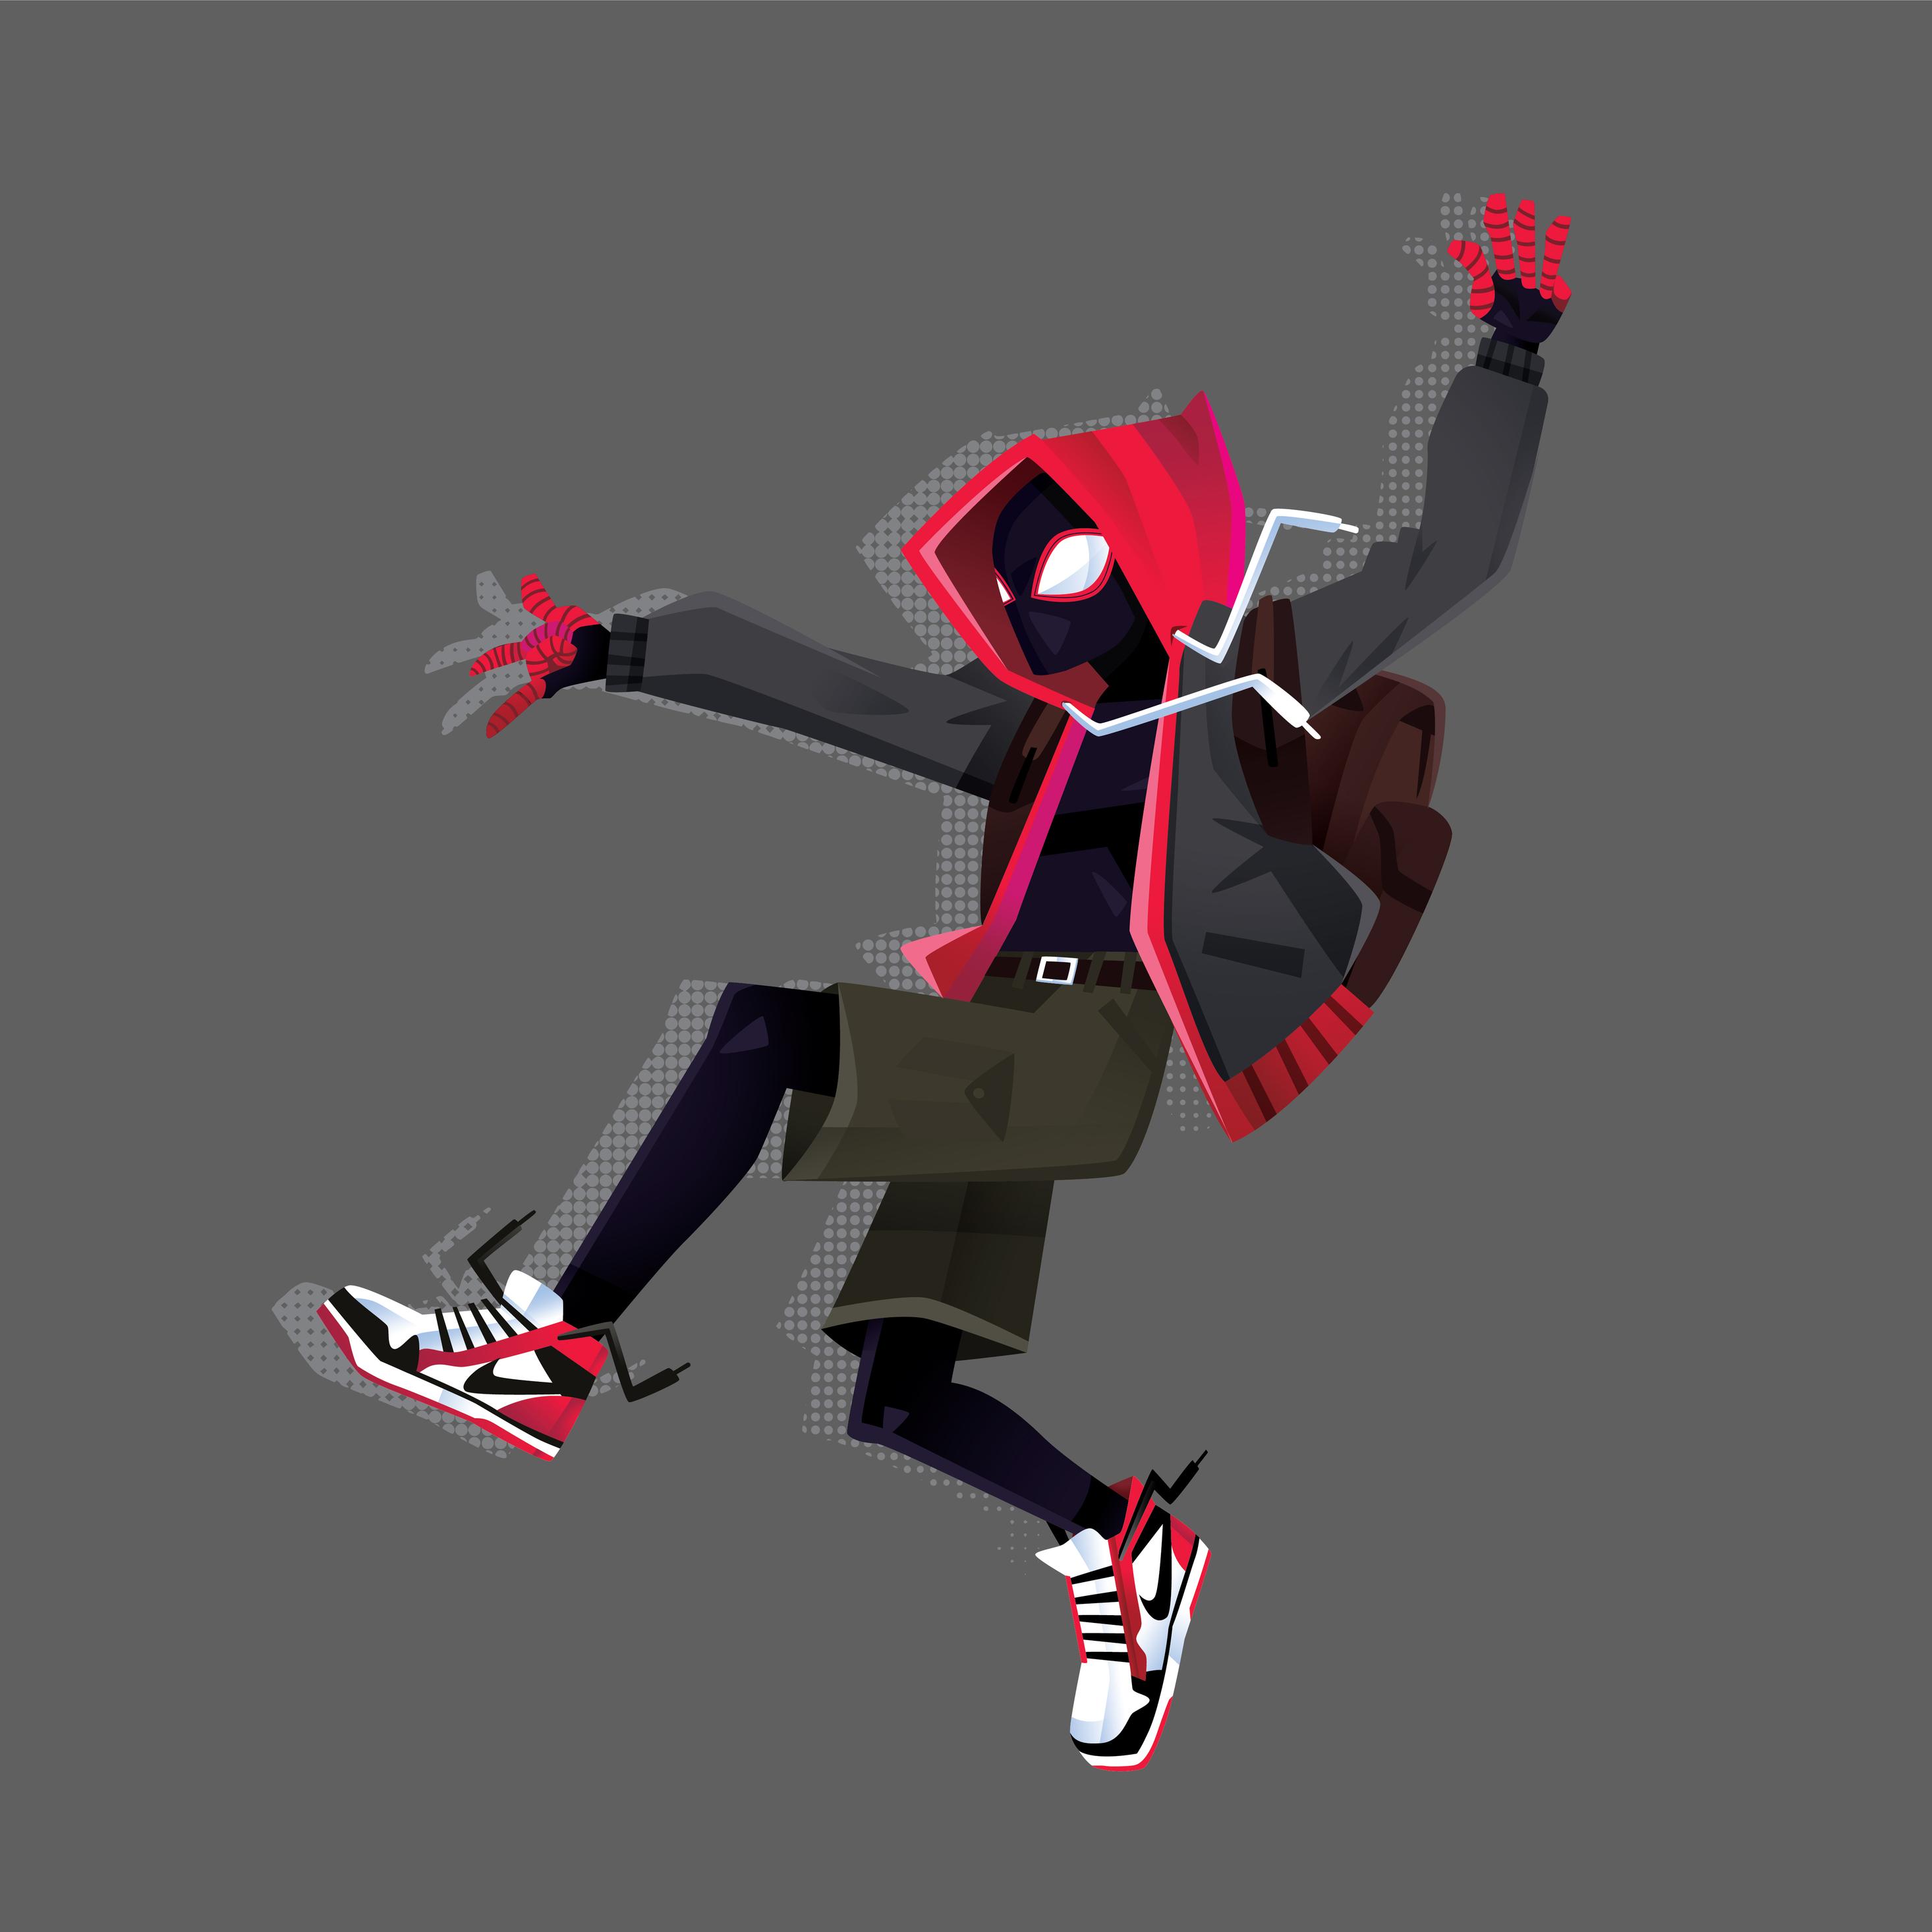 spiderman-miles-morales-new-arts-5k-4l.jpg